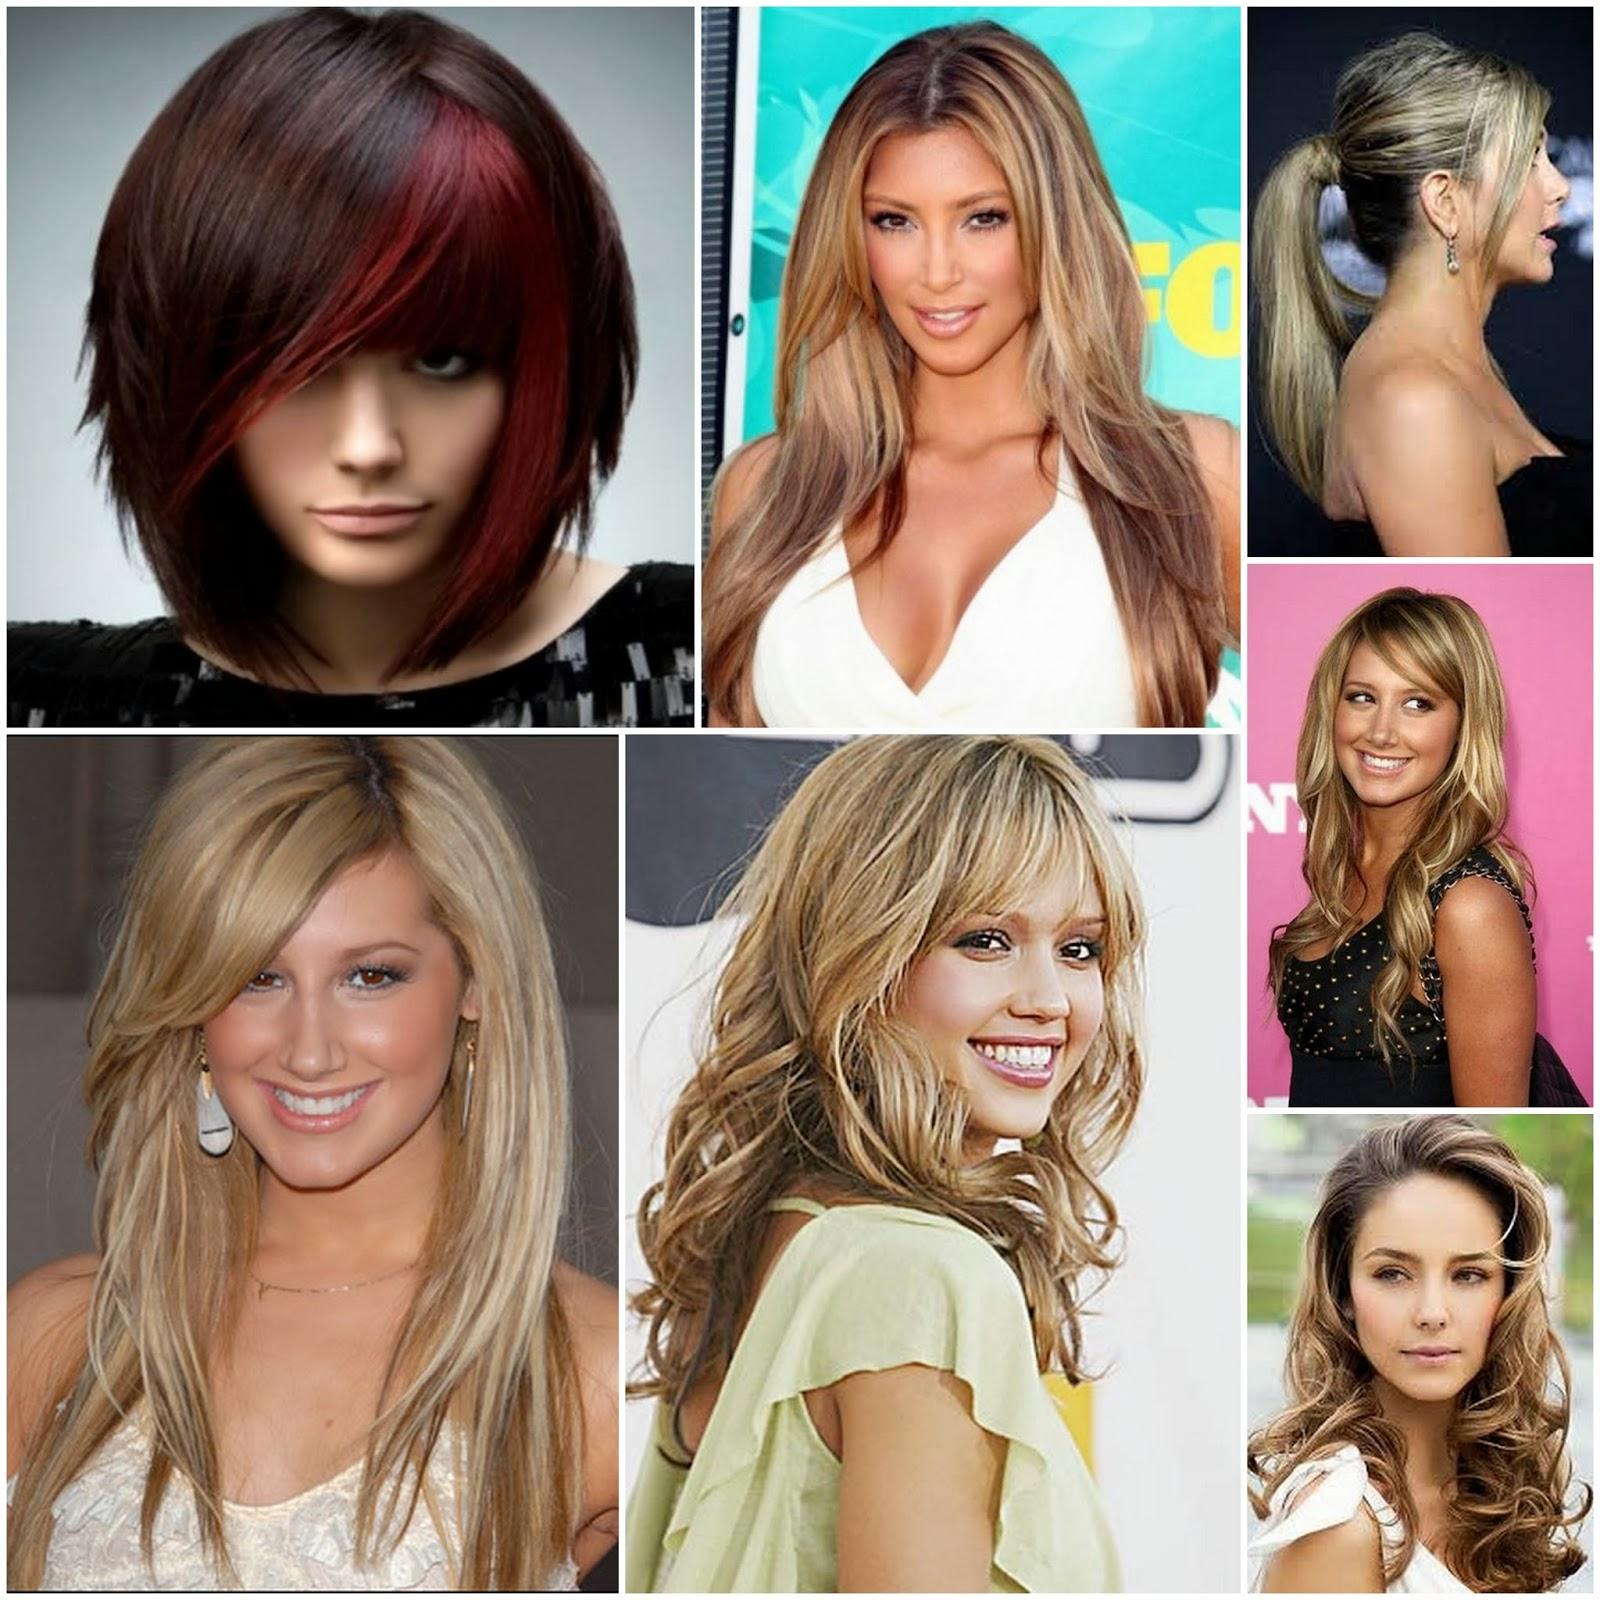 hårslingor i olika färger